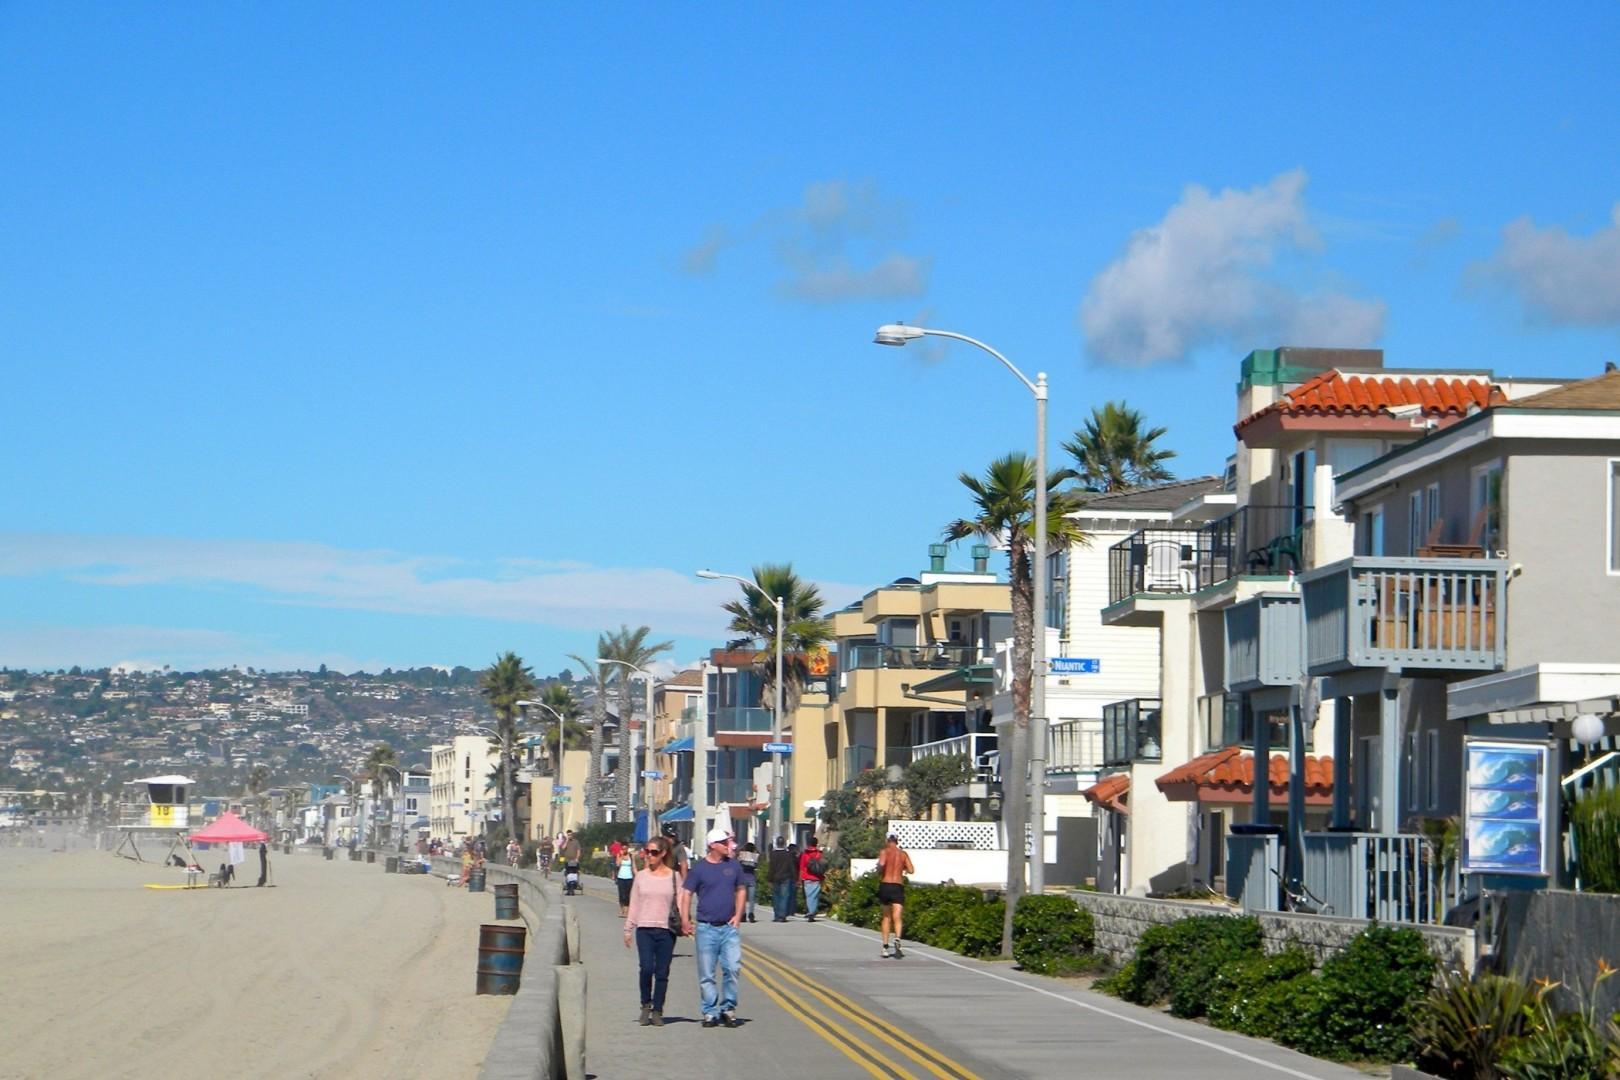 Ocean Front Walk in Mission Beach